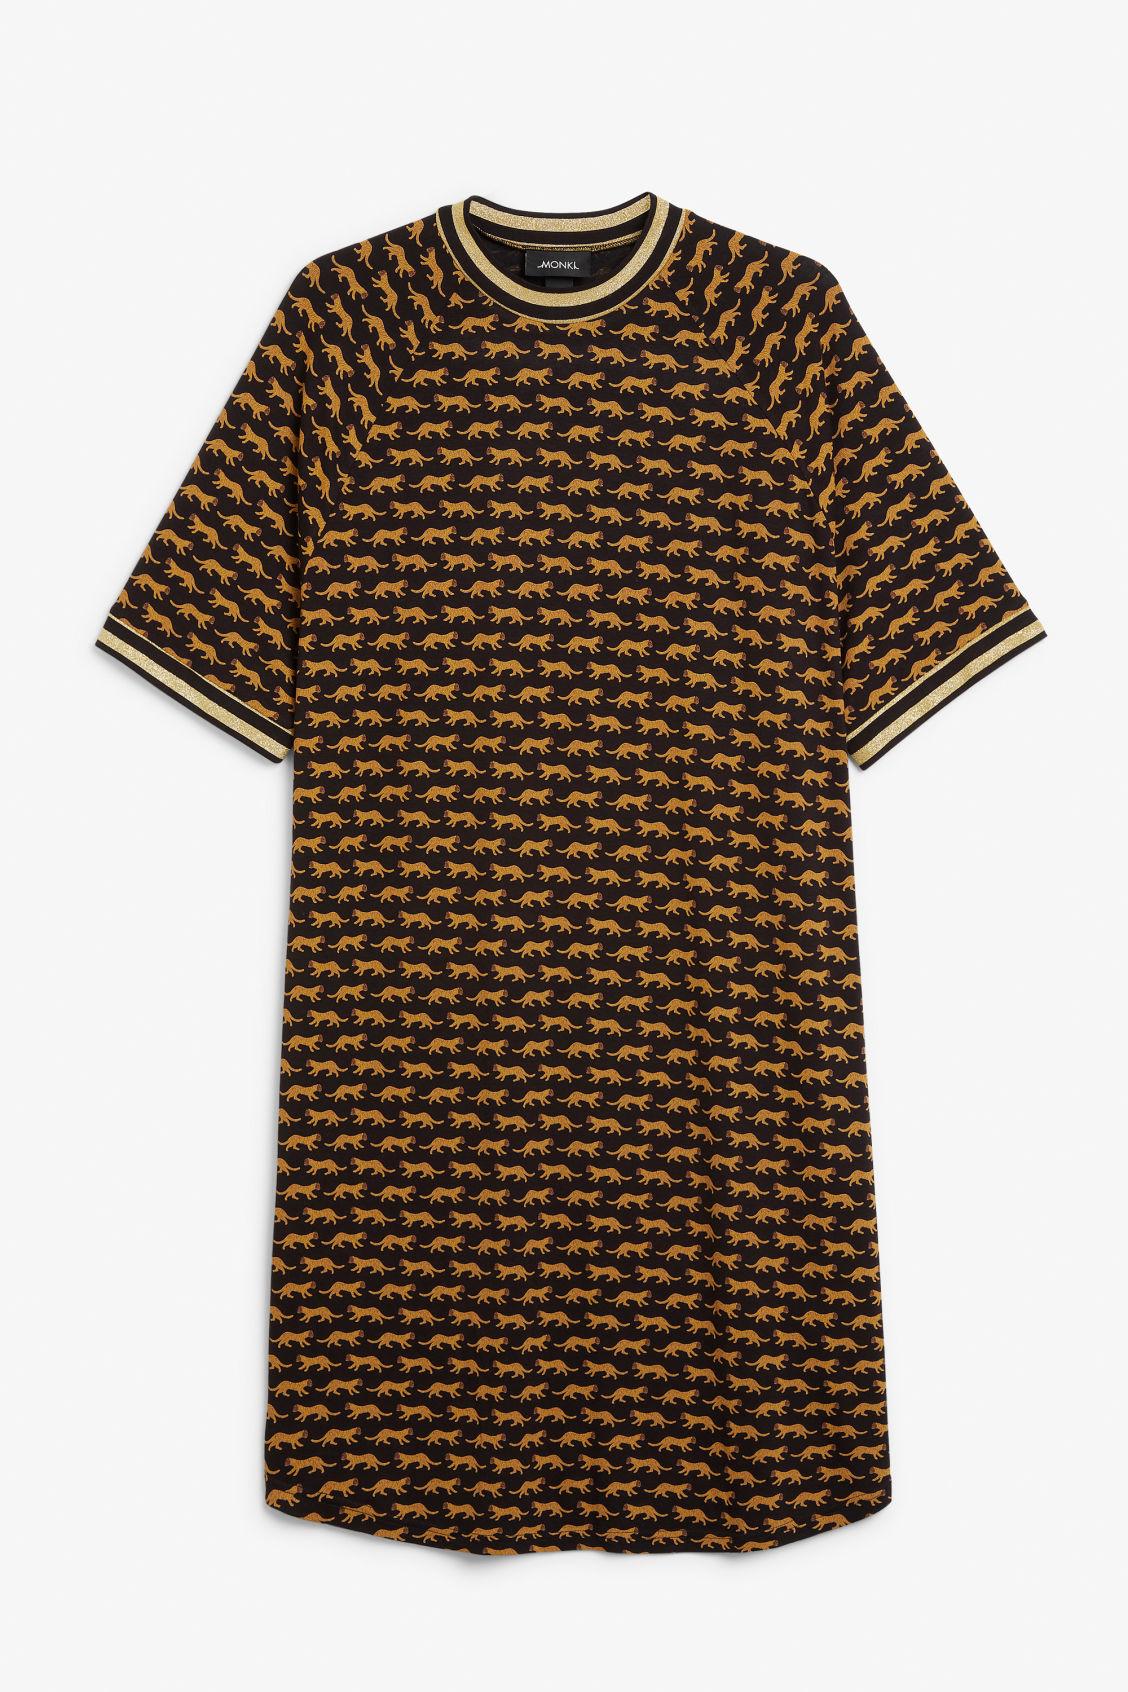 0bfed517b4 Sporty t-shirt dress - Tiger print - Dresses - Monki